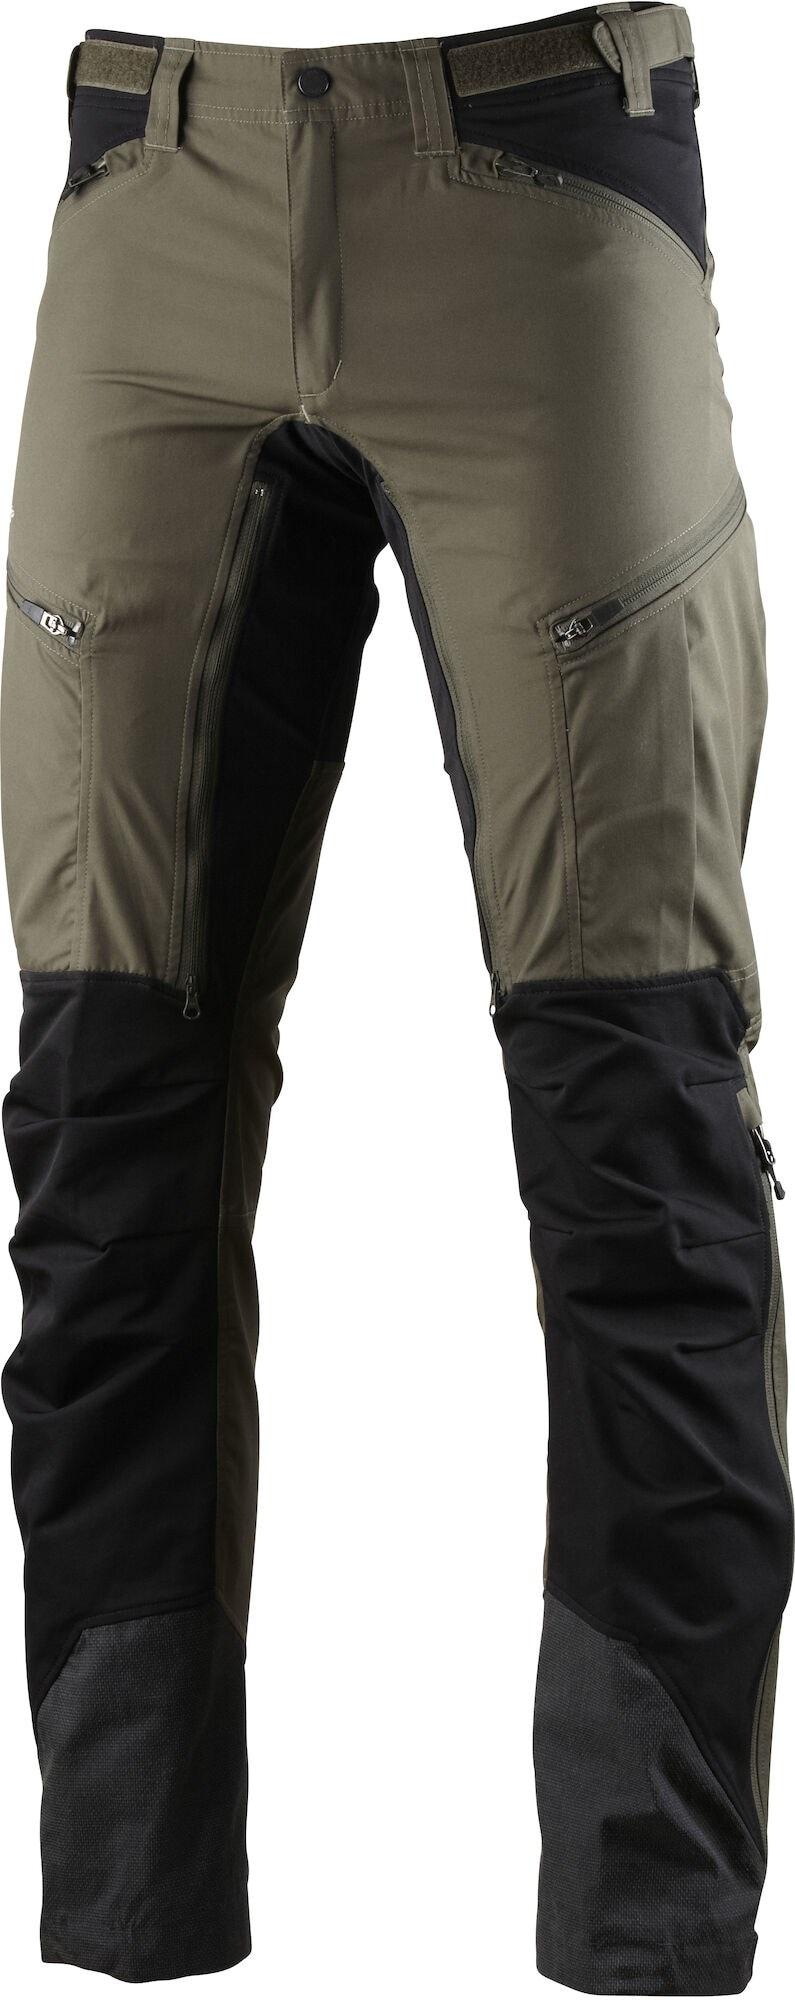 Lundhags Makke Pants Short, M's